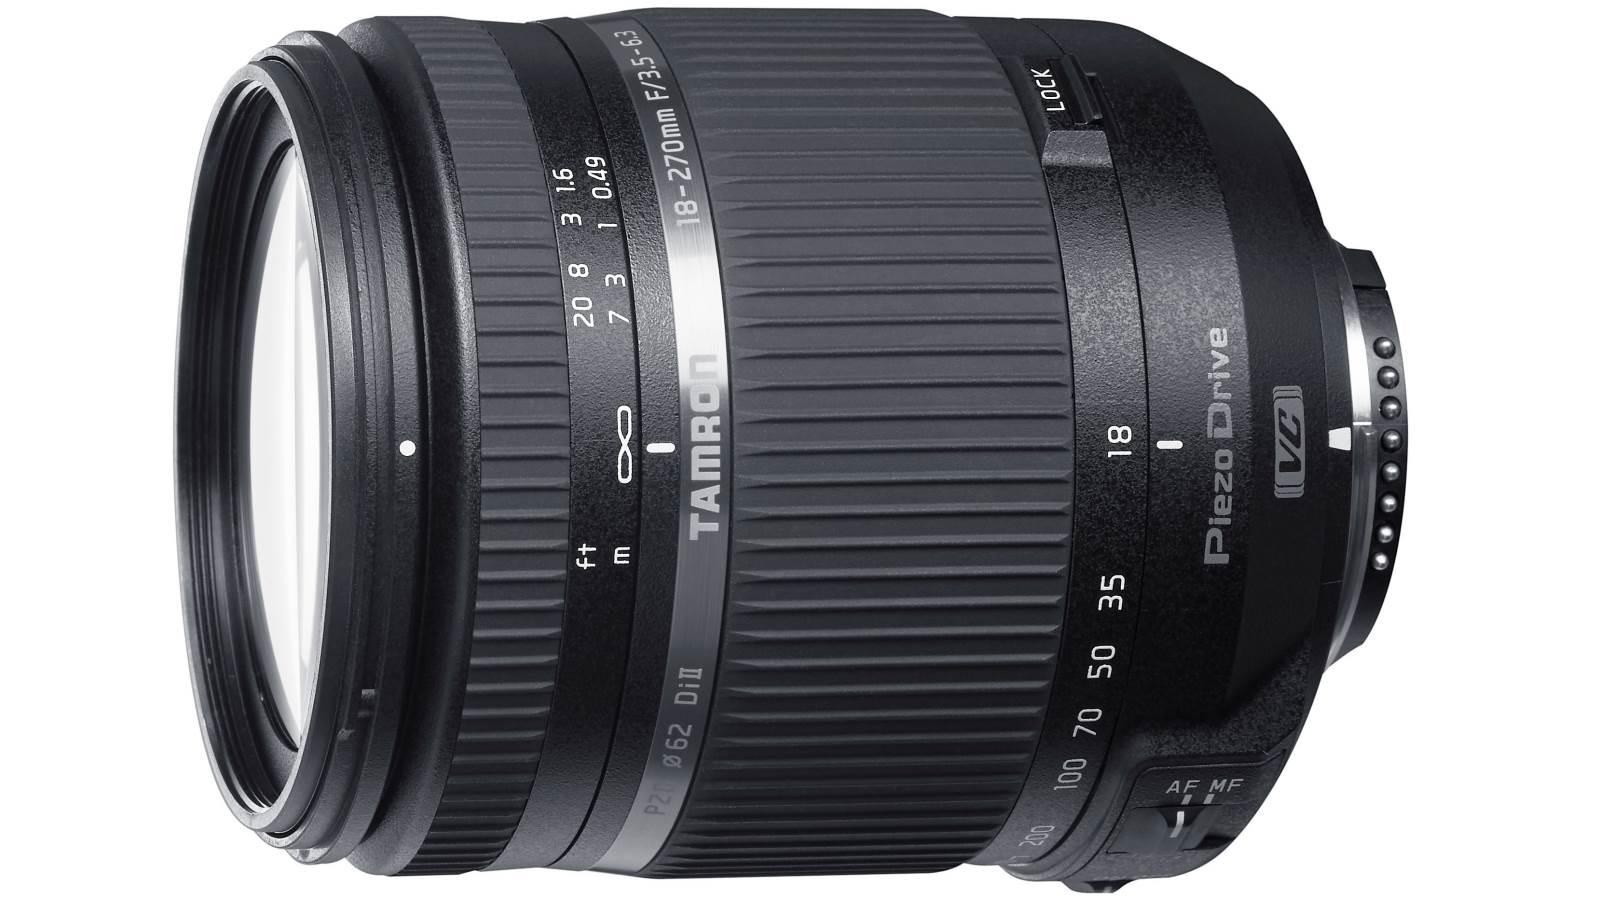 Buy Tamron 18 270mm F3 5 6 3 Di Ii Vc Pzd Lens For Nikon Harvey Norman Au